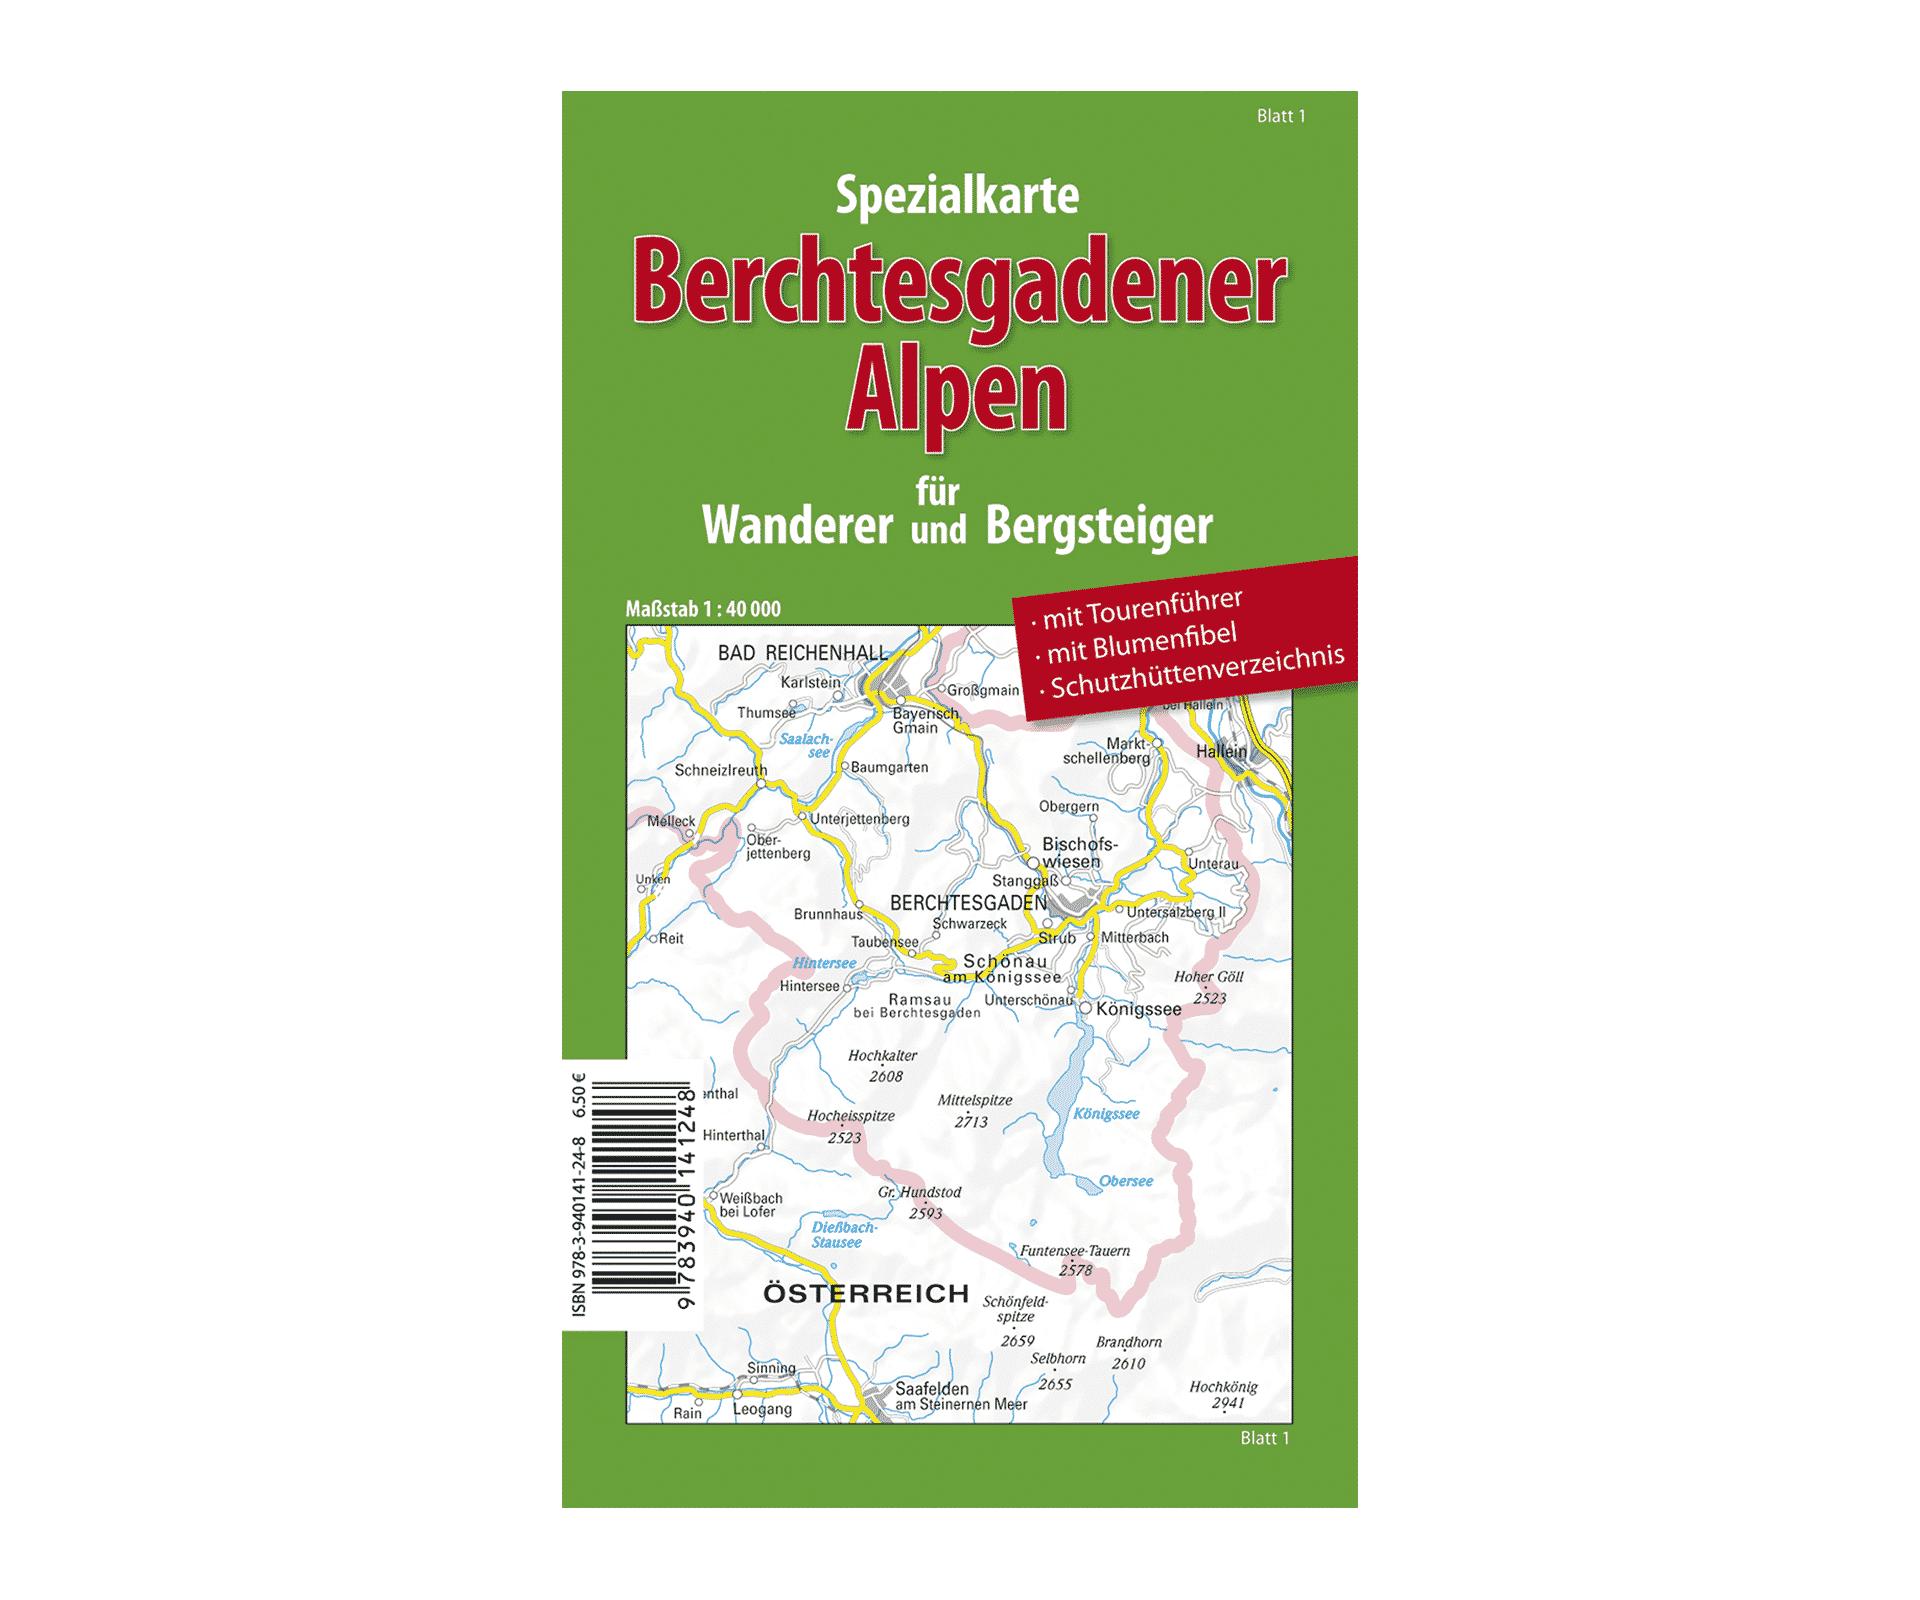 Berchtesgadener Land Karte.Spezialkarte Berchtesgadener Alpen 1 40 000